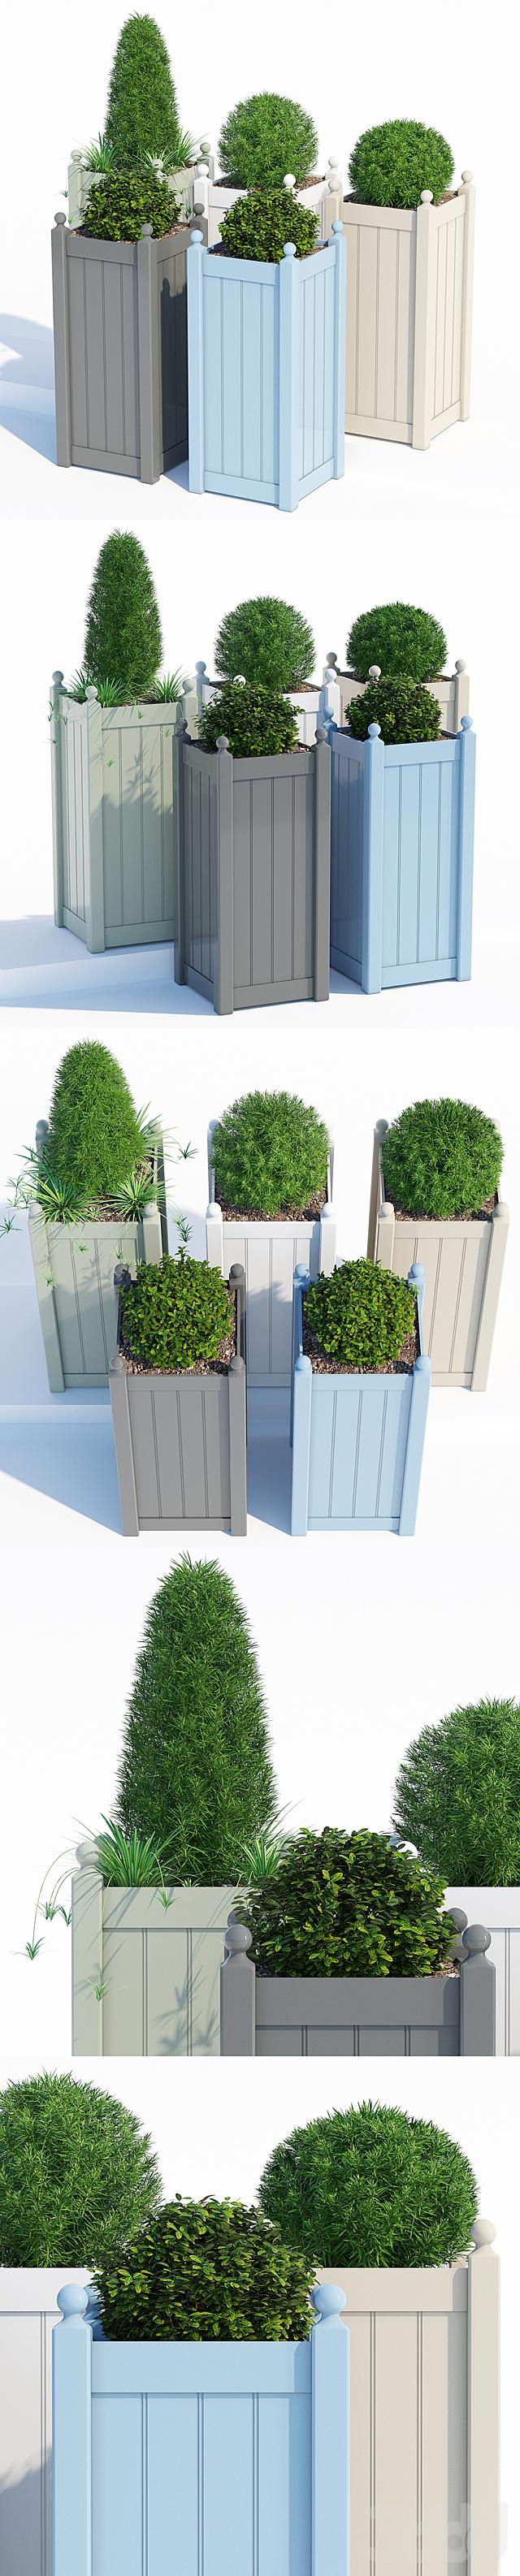 Timber tall planter